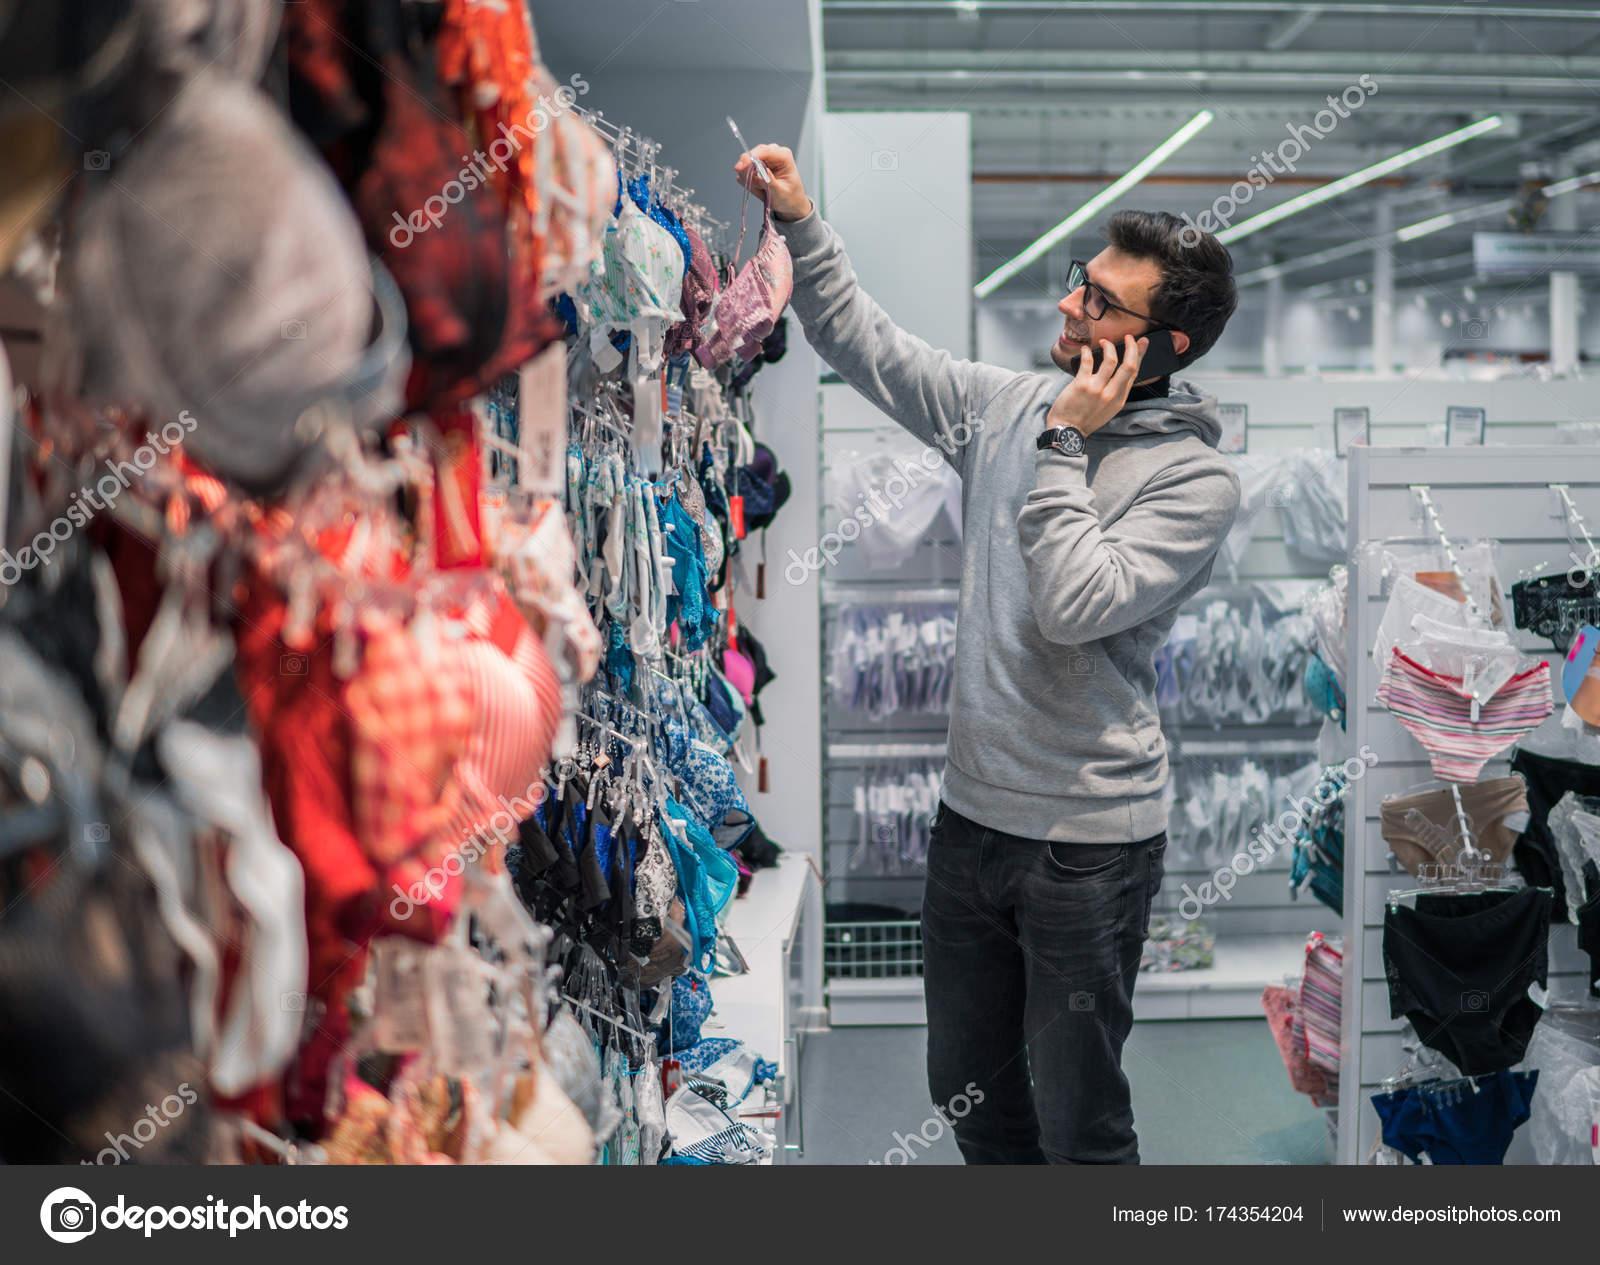 b79d8d091d25 Imágenes: vergüenzas | hombre de elegir ropa interior de lencería ...